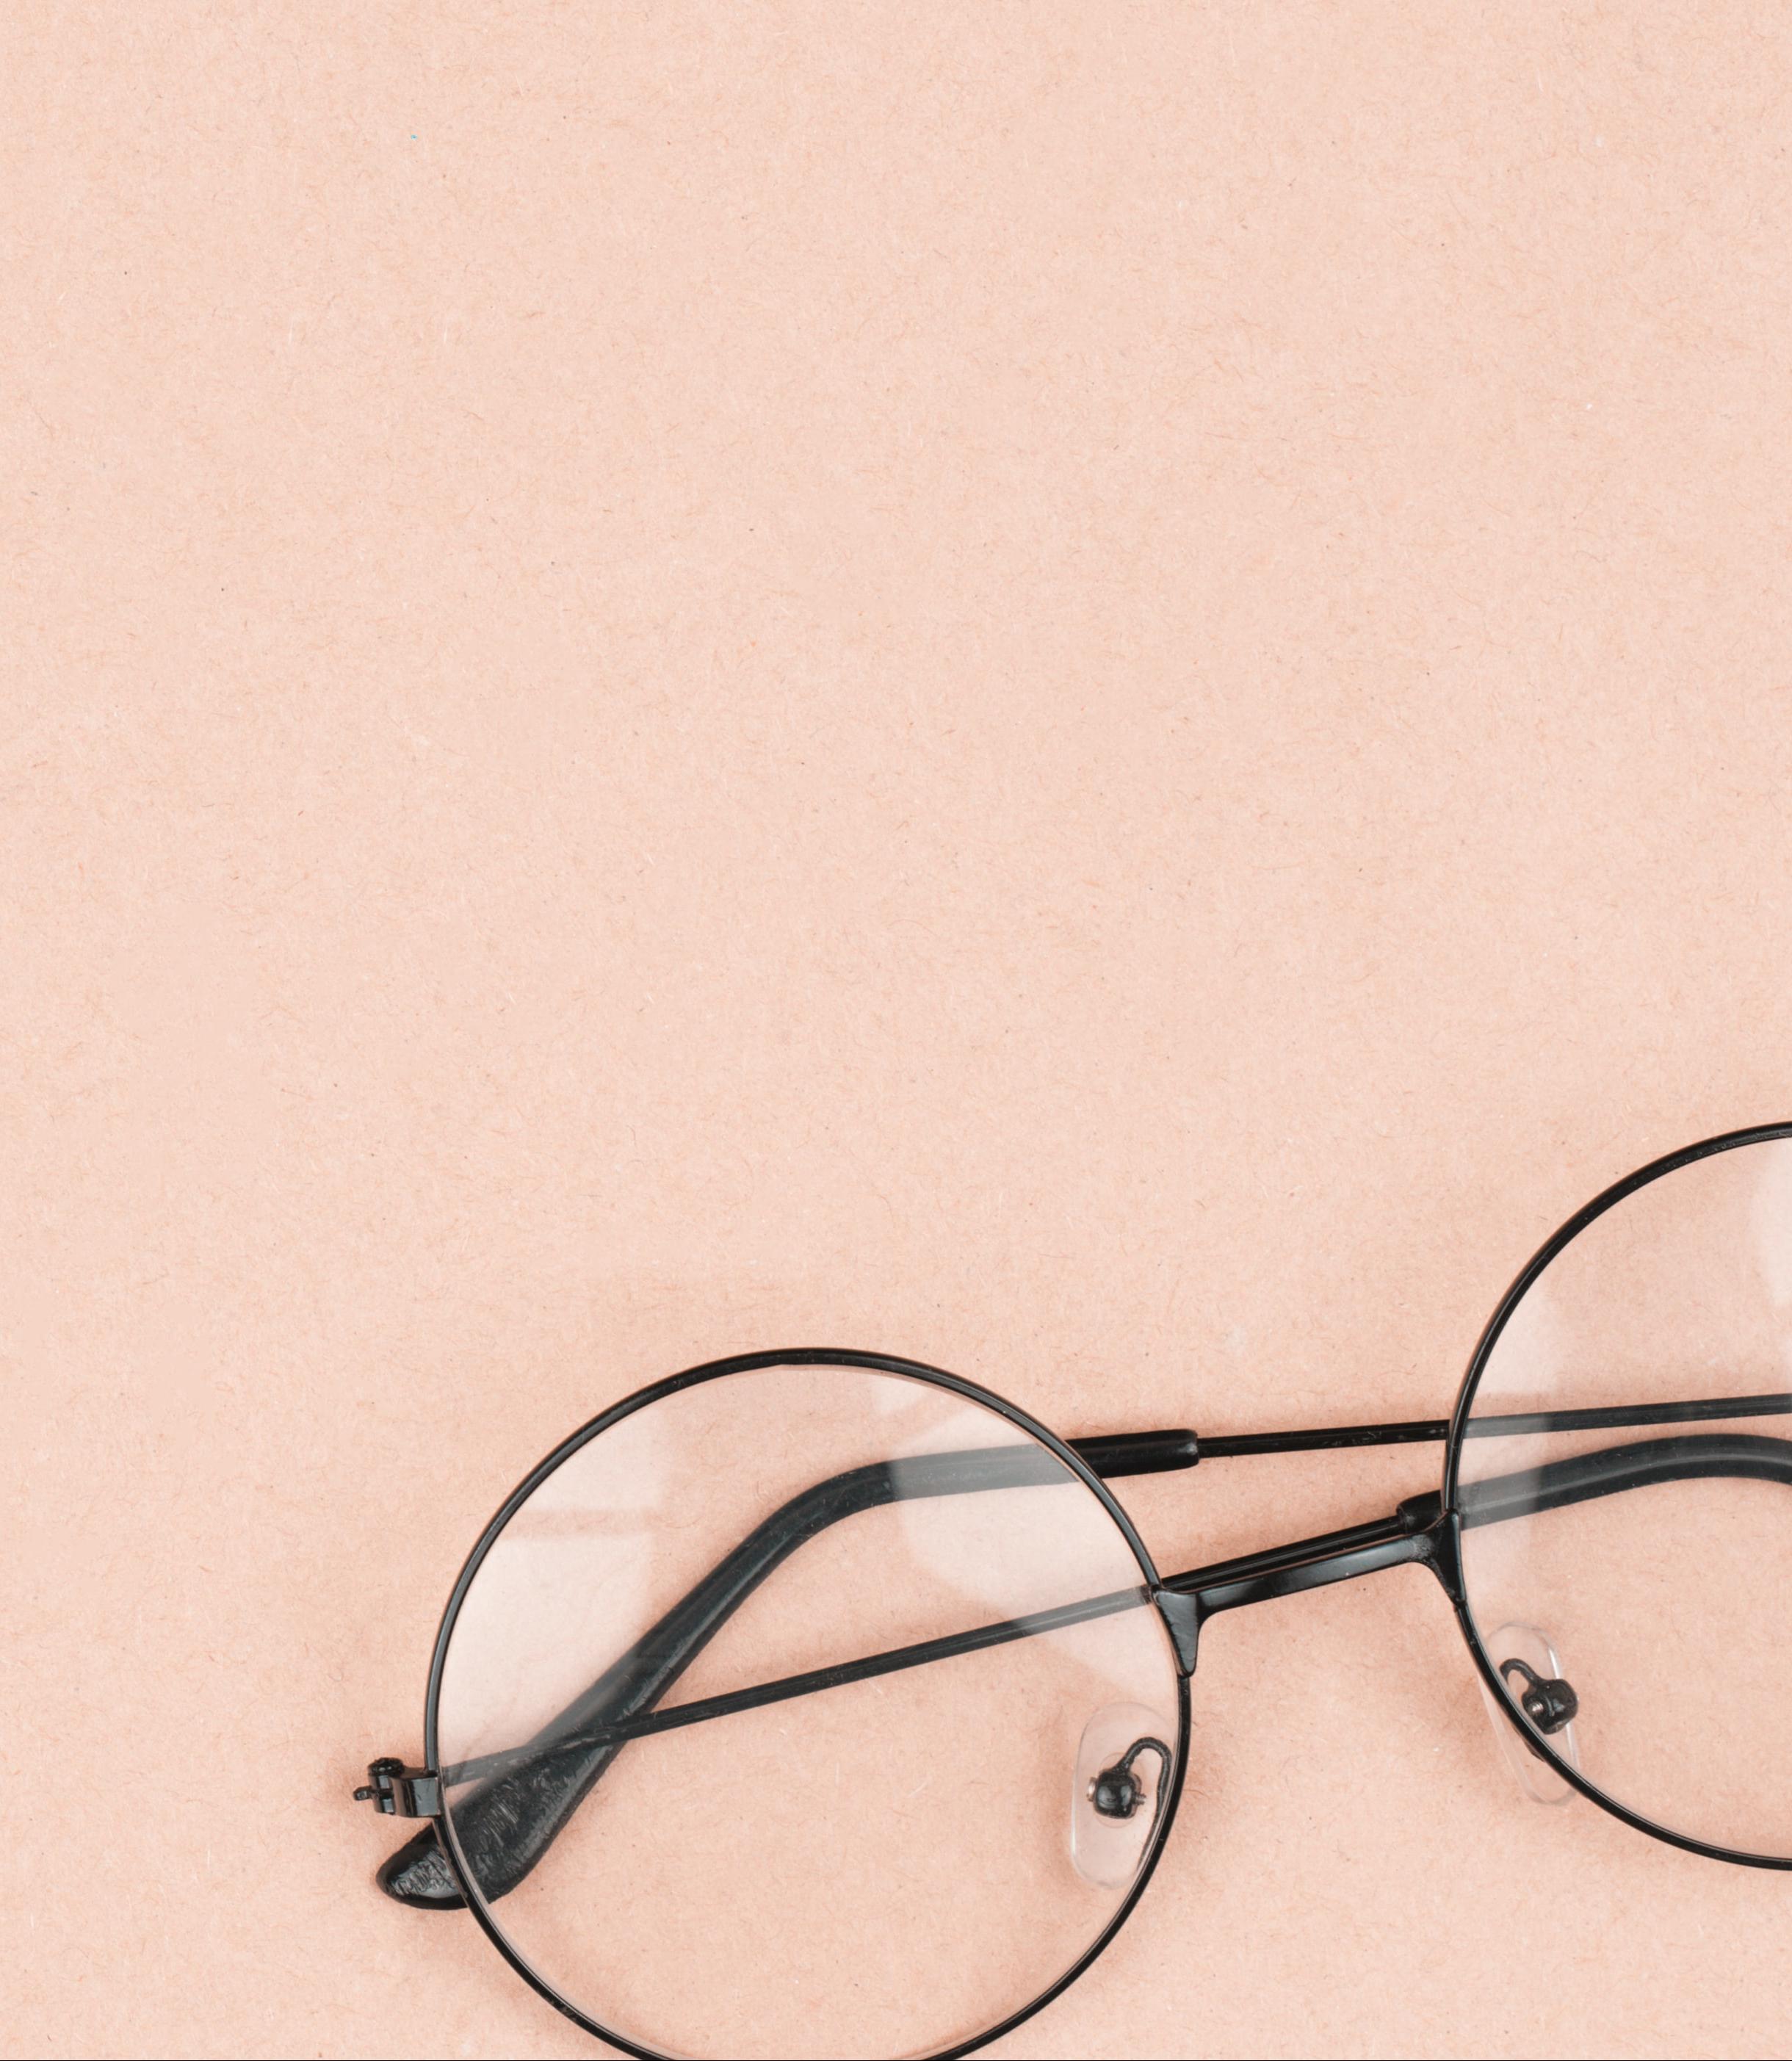 eyeglasses depicting informative content